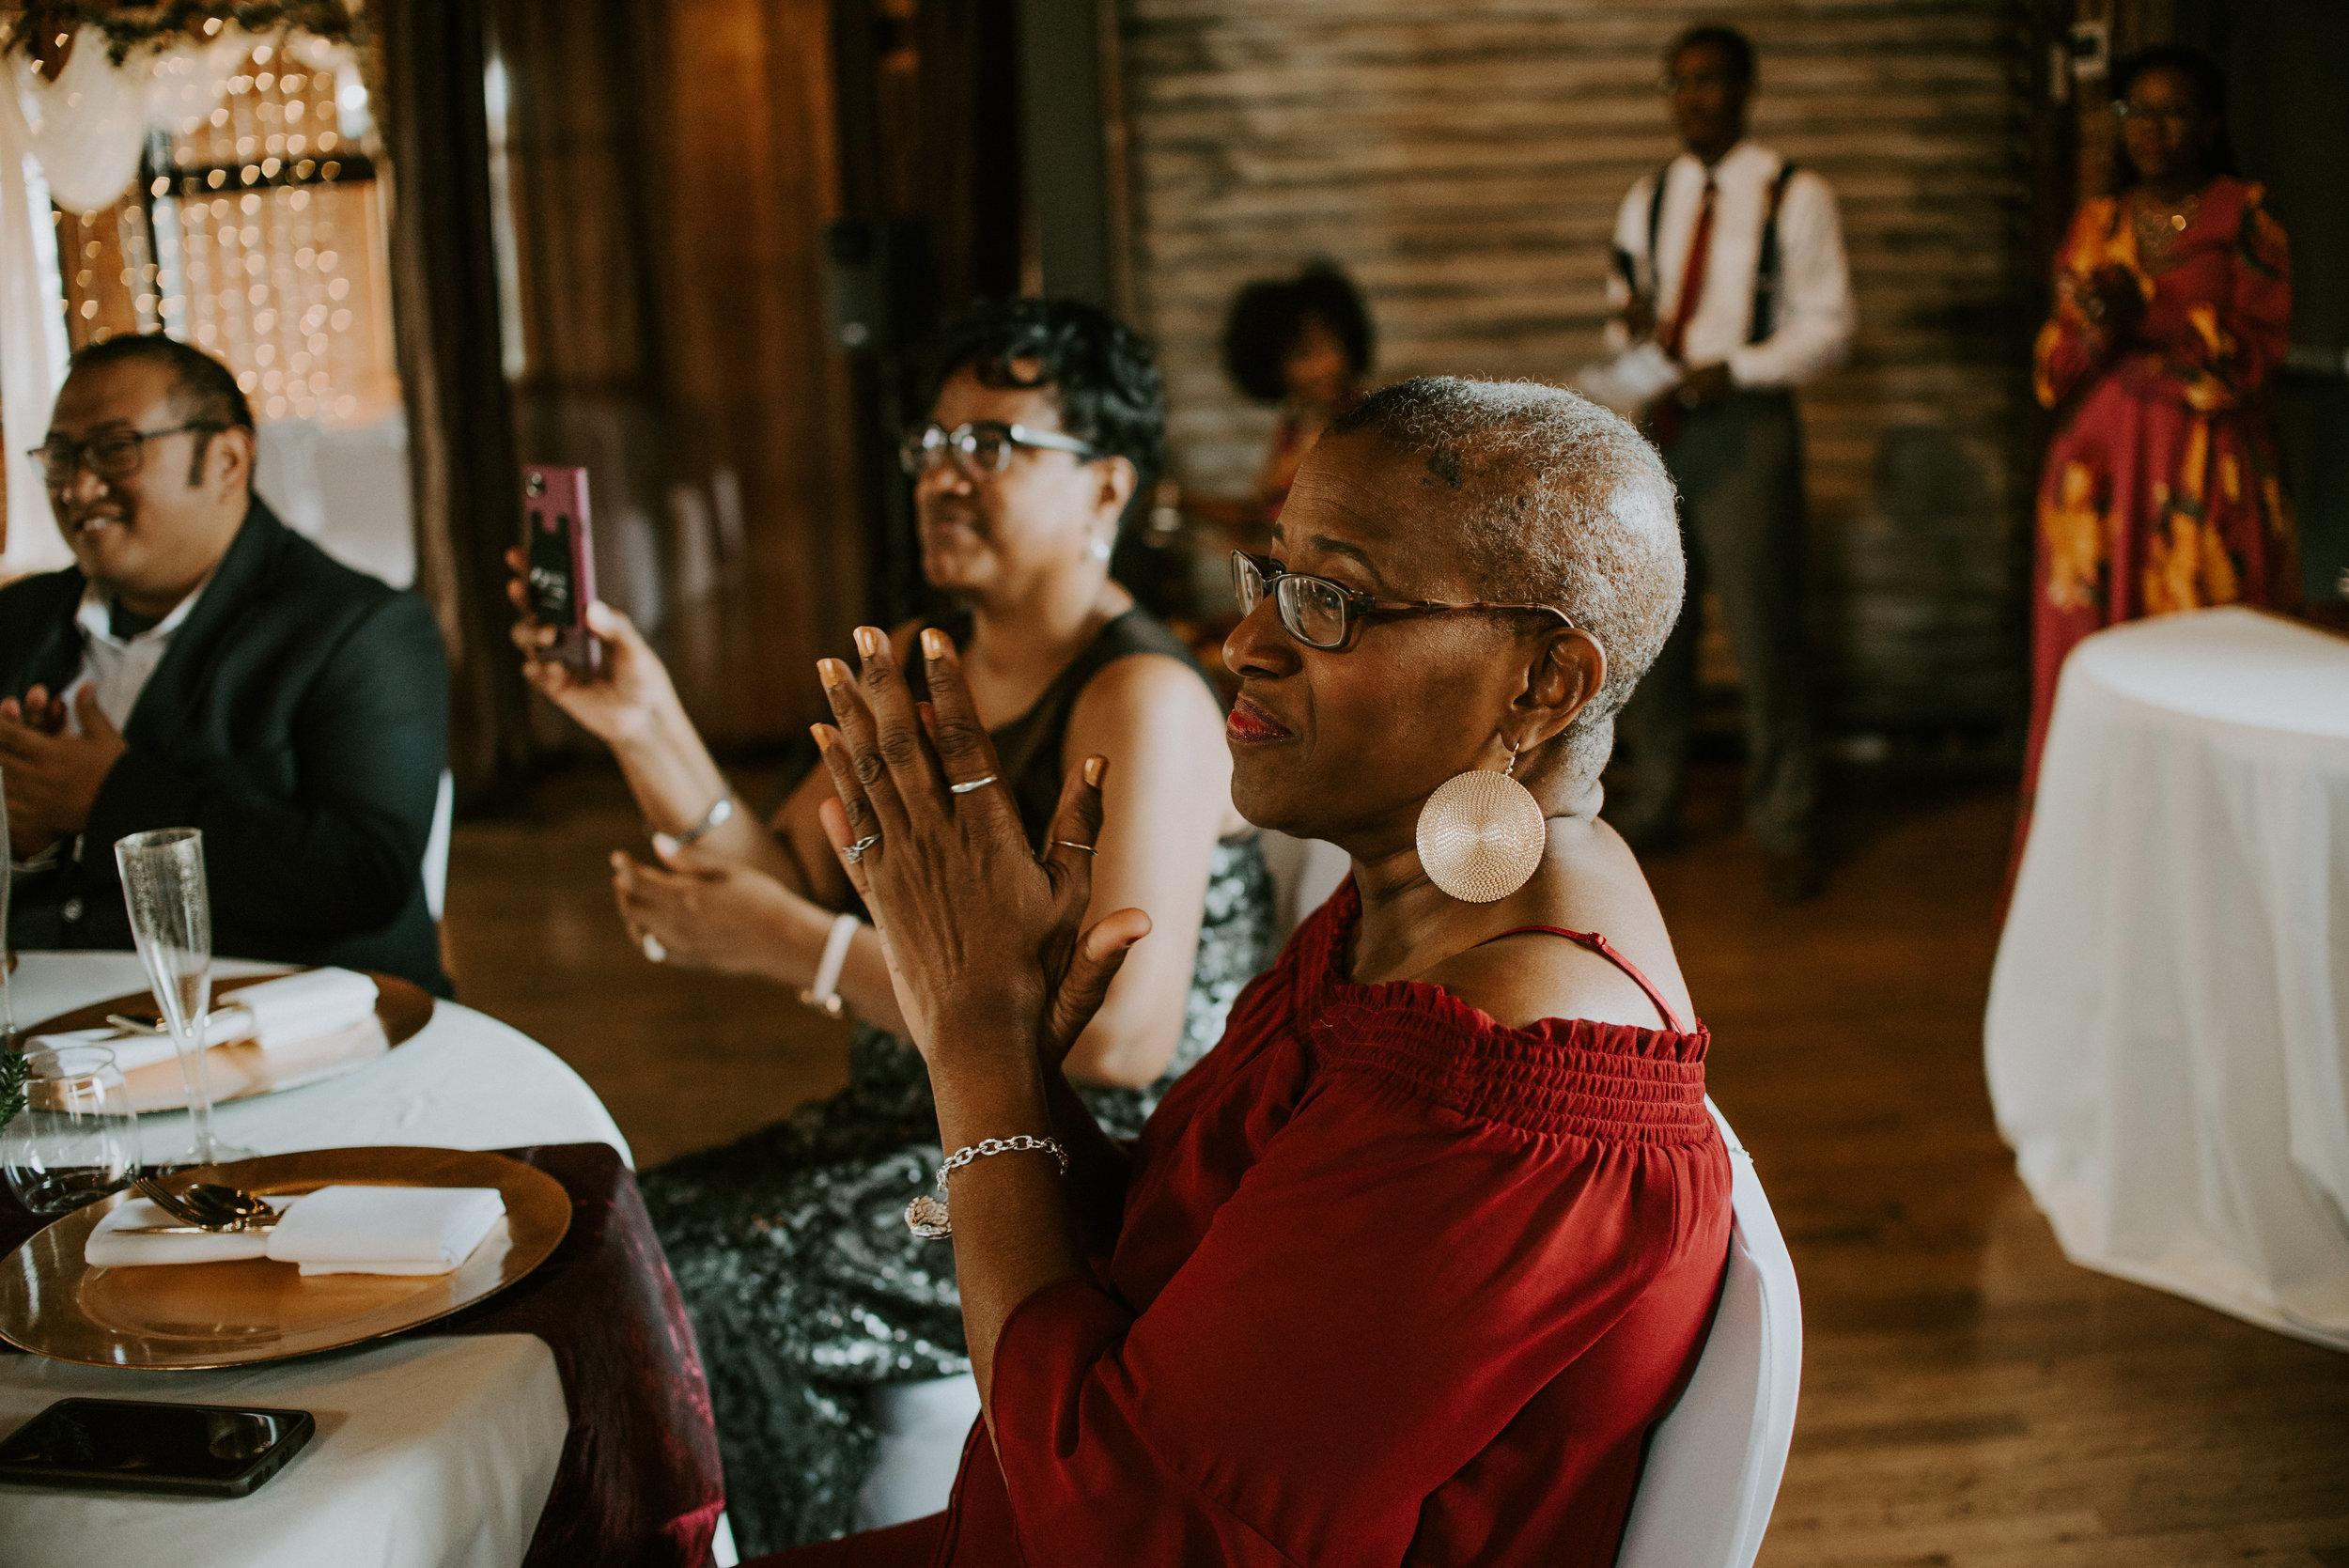 WonderlyCreative_Wedding_6.7.18_Khara&Dwayne_-837.jpg